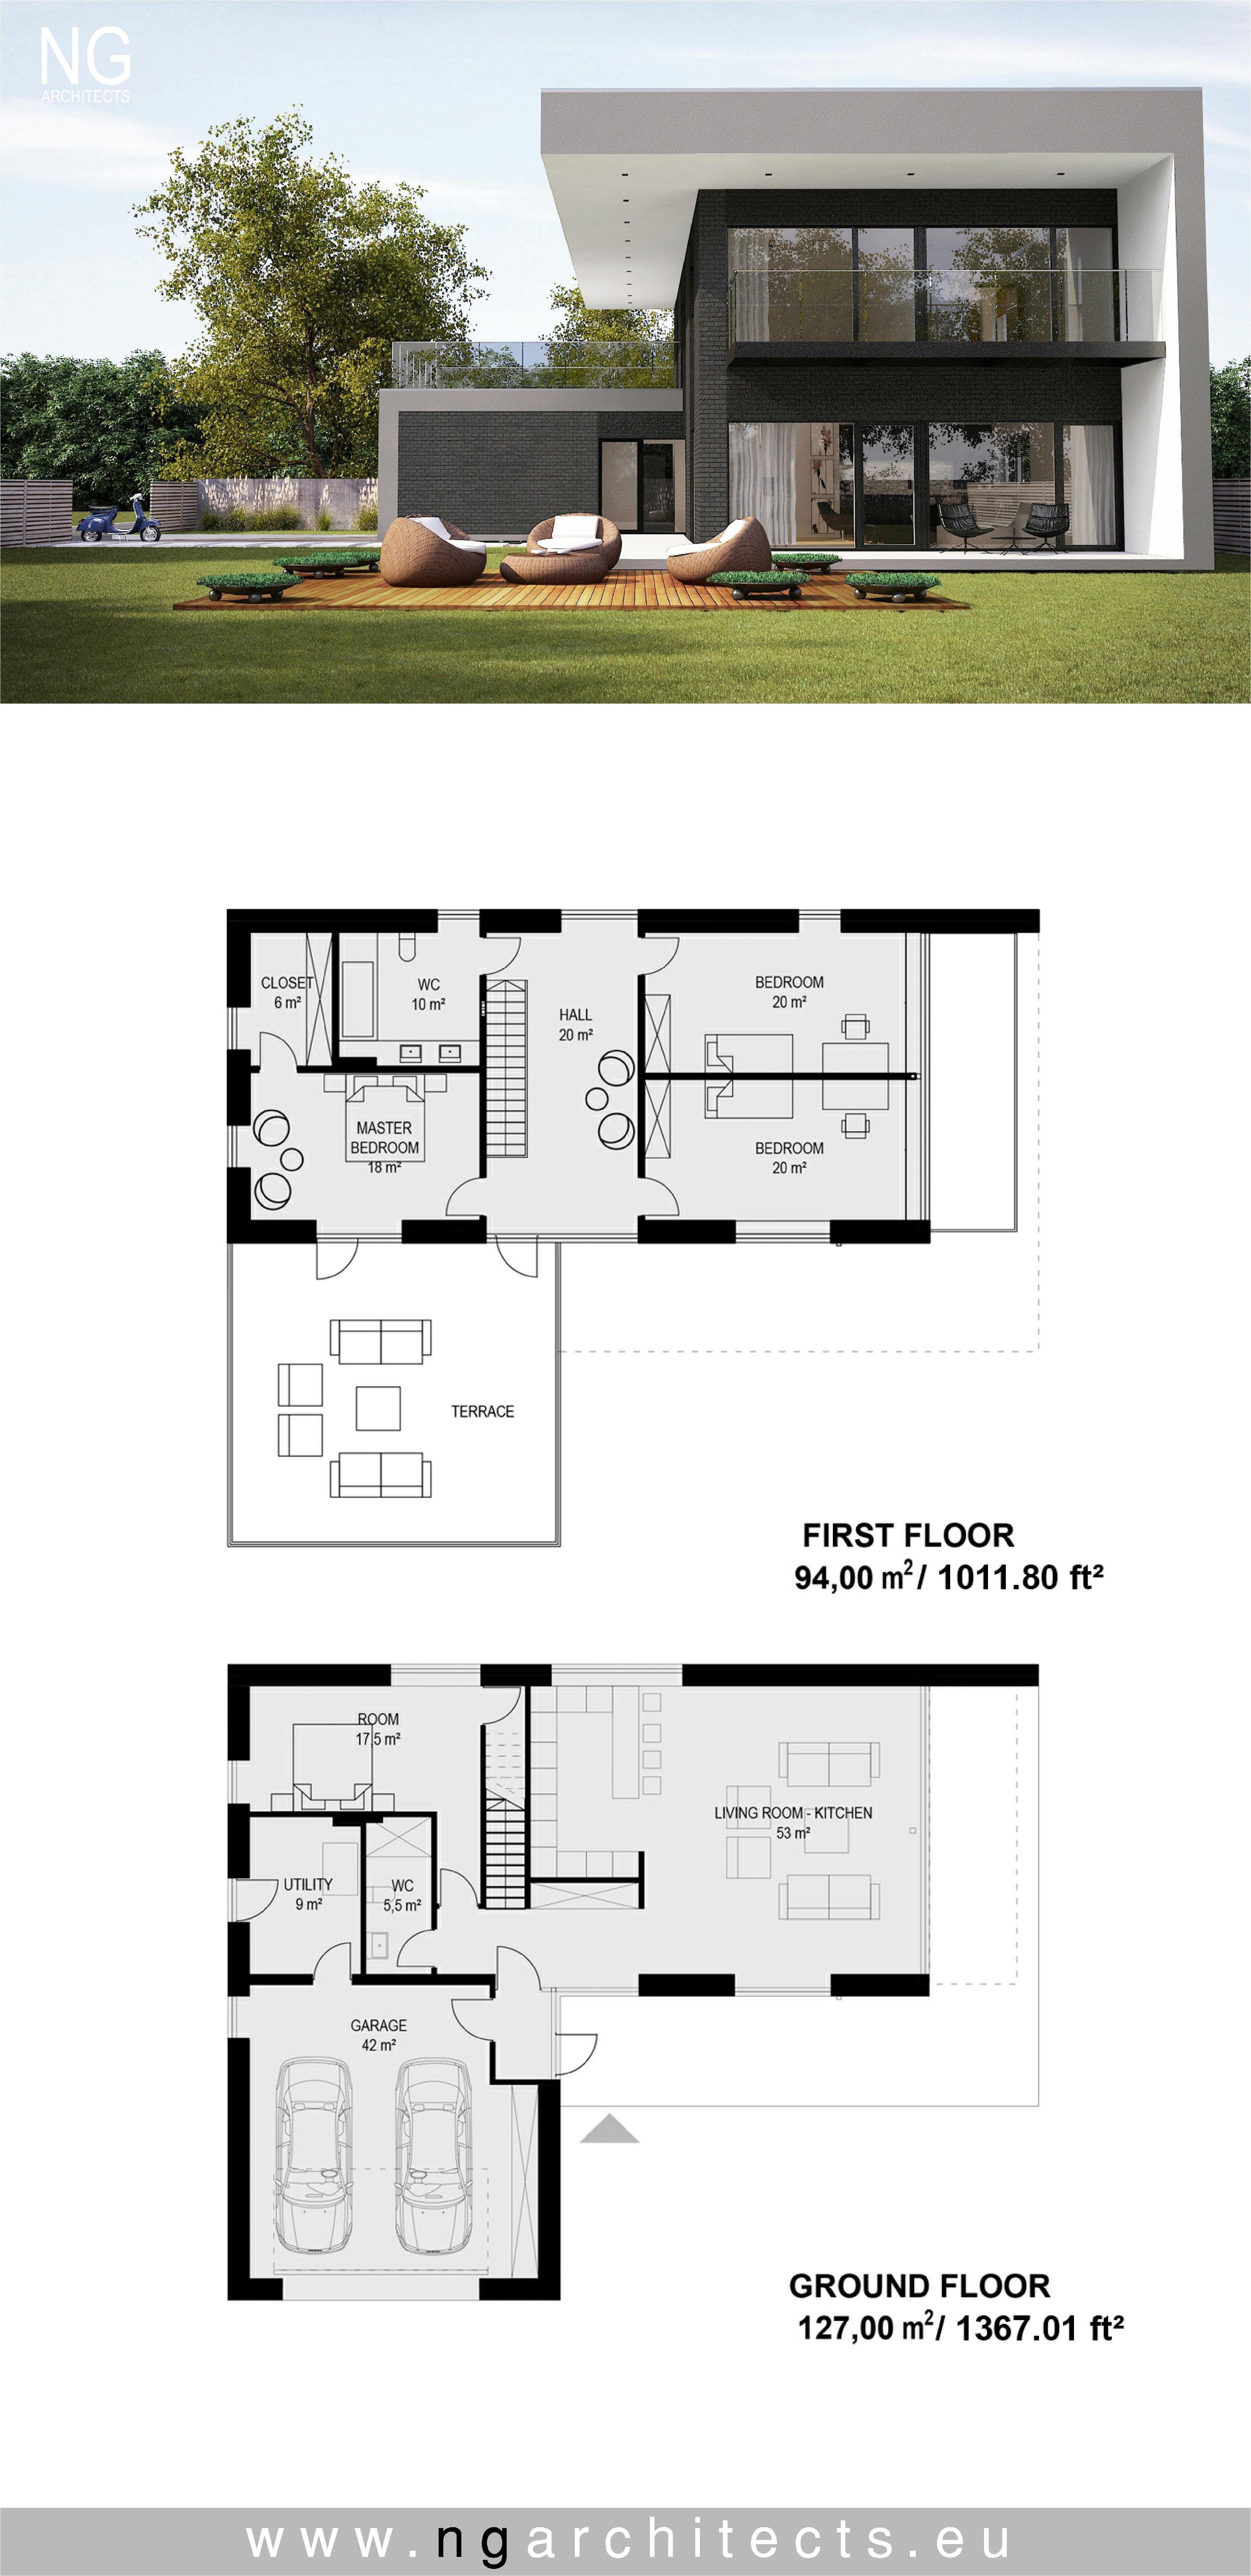 Watch - Villa modern floor plans photo video